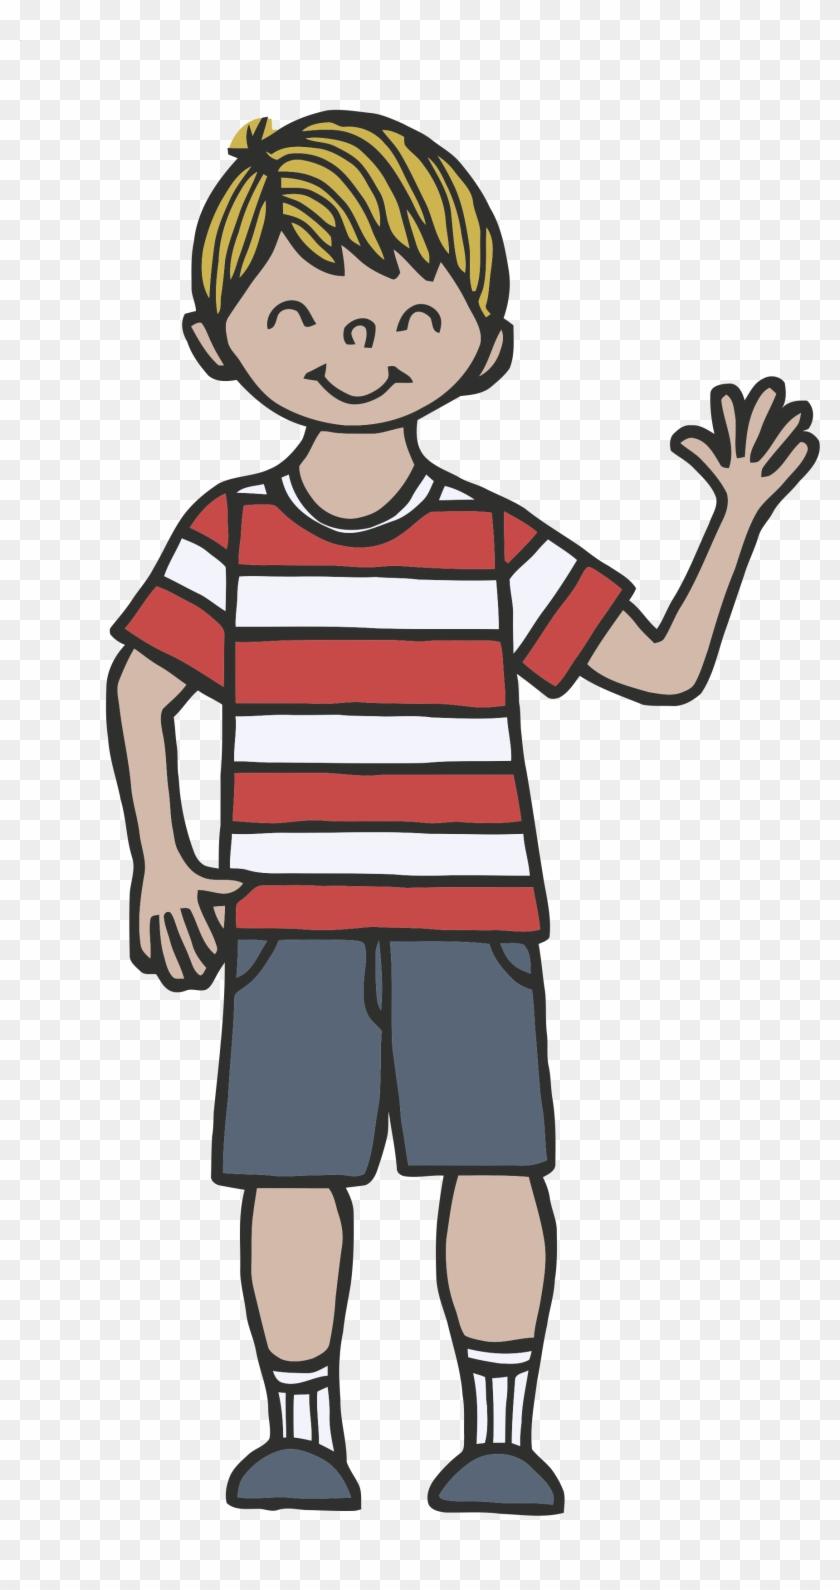 medium resolution of child waving goodbye clipart tall boy clip art